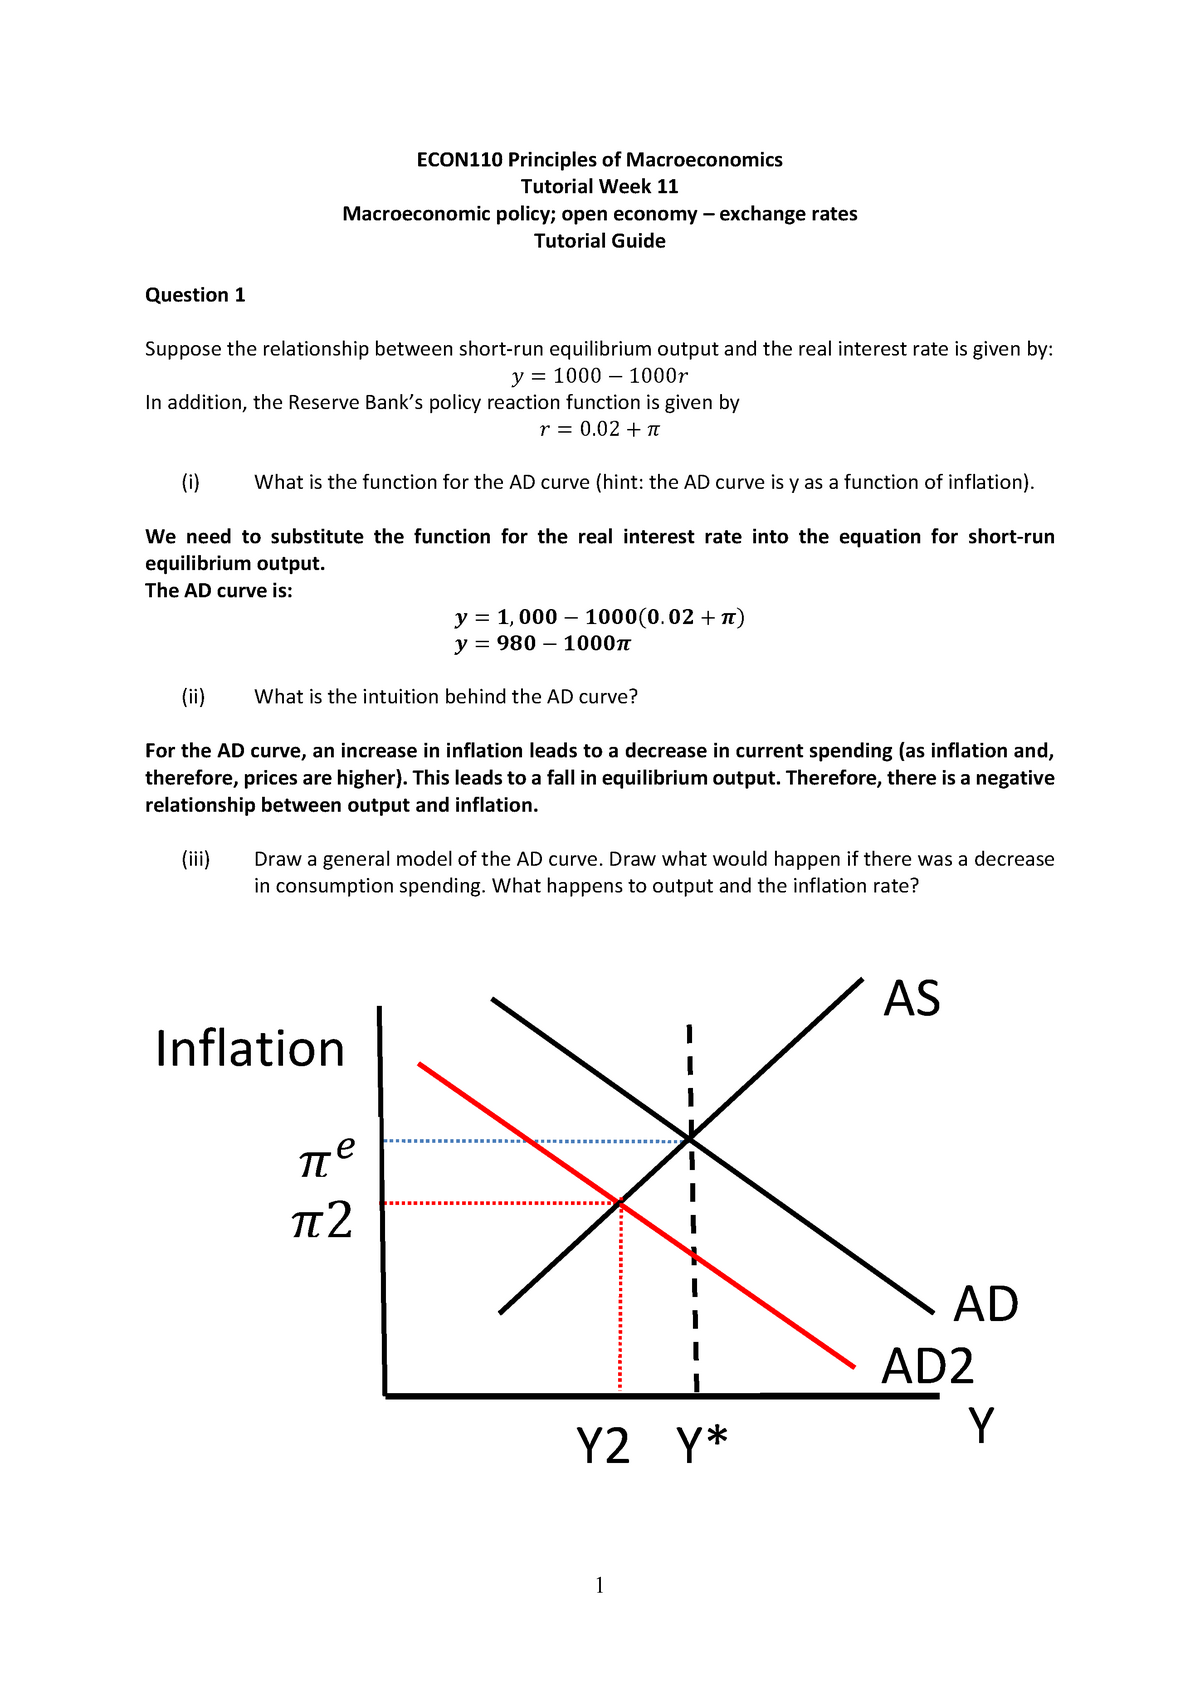 Tutorial Week 11 ECON110 - ECON110: Macroeconomic Principles - StuDocu